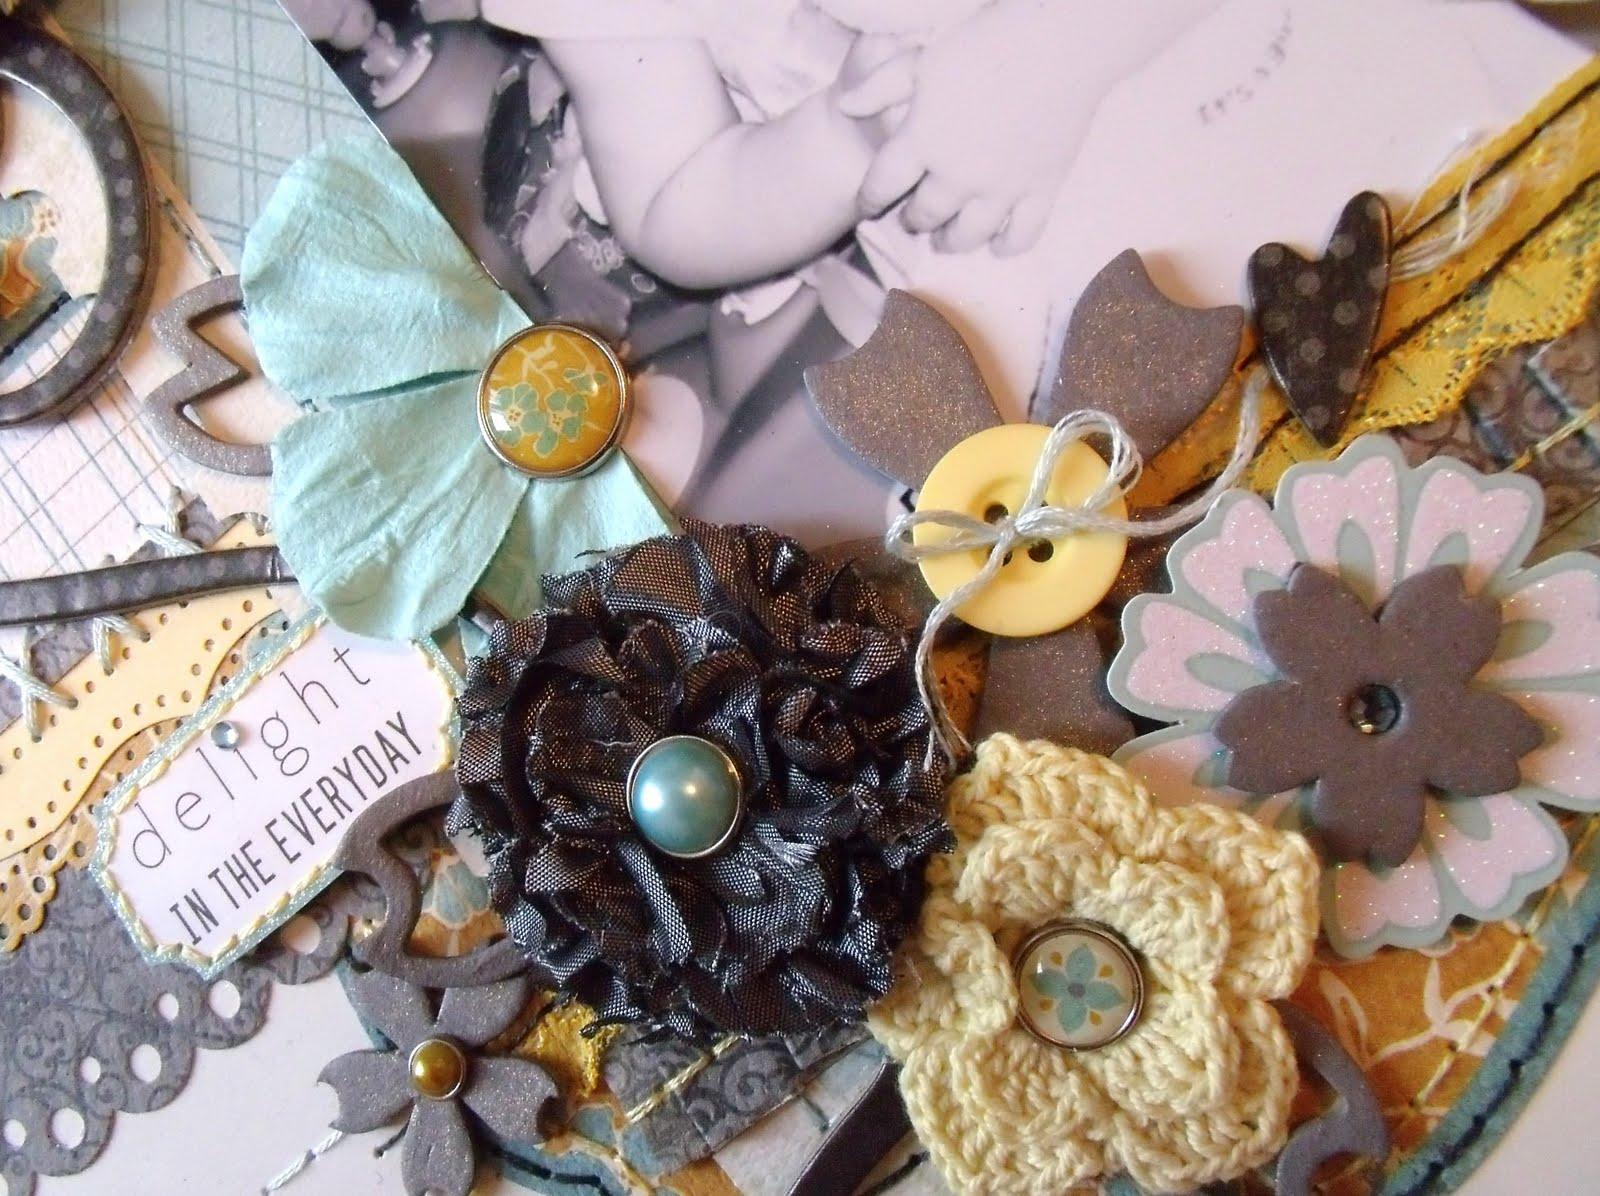 http://1.bp.blogspot.com/-58E-zV0Iej0/Tcp_y-59QfI/AAAAAAAAATQ/Y6r4RrFxpuQ/s1600/Bear-y+Delightful+-+details4.jpg